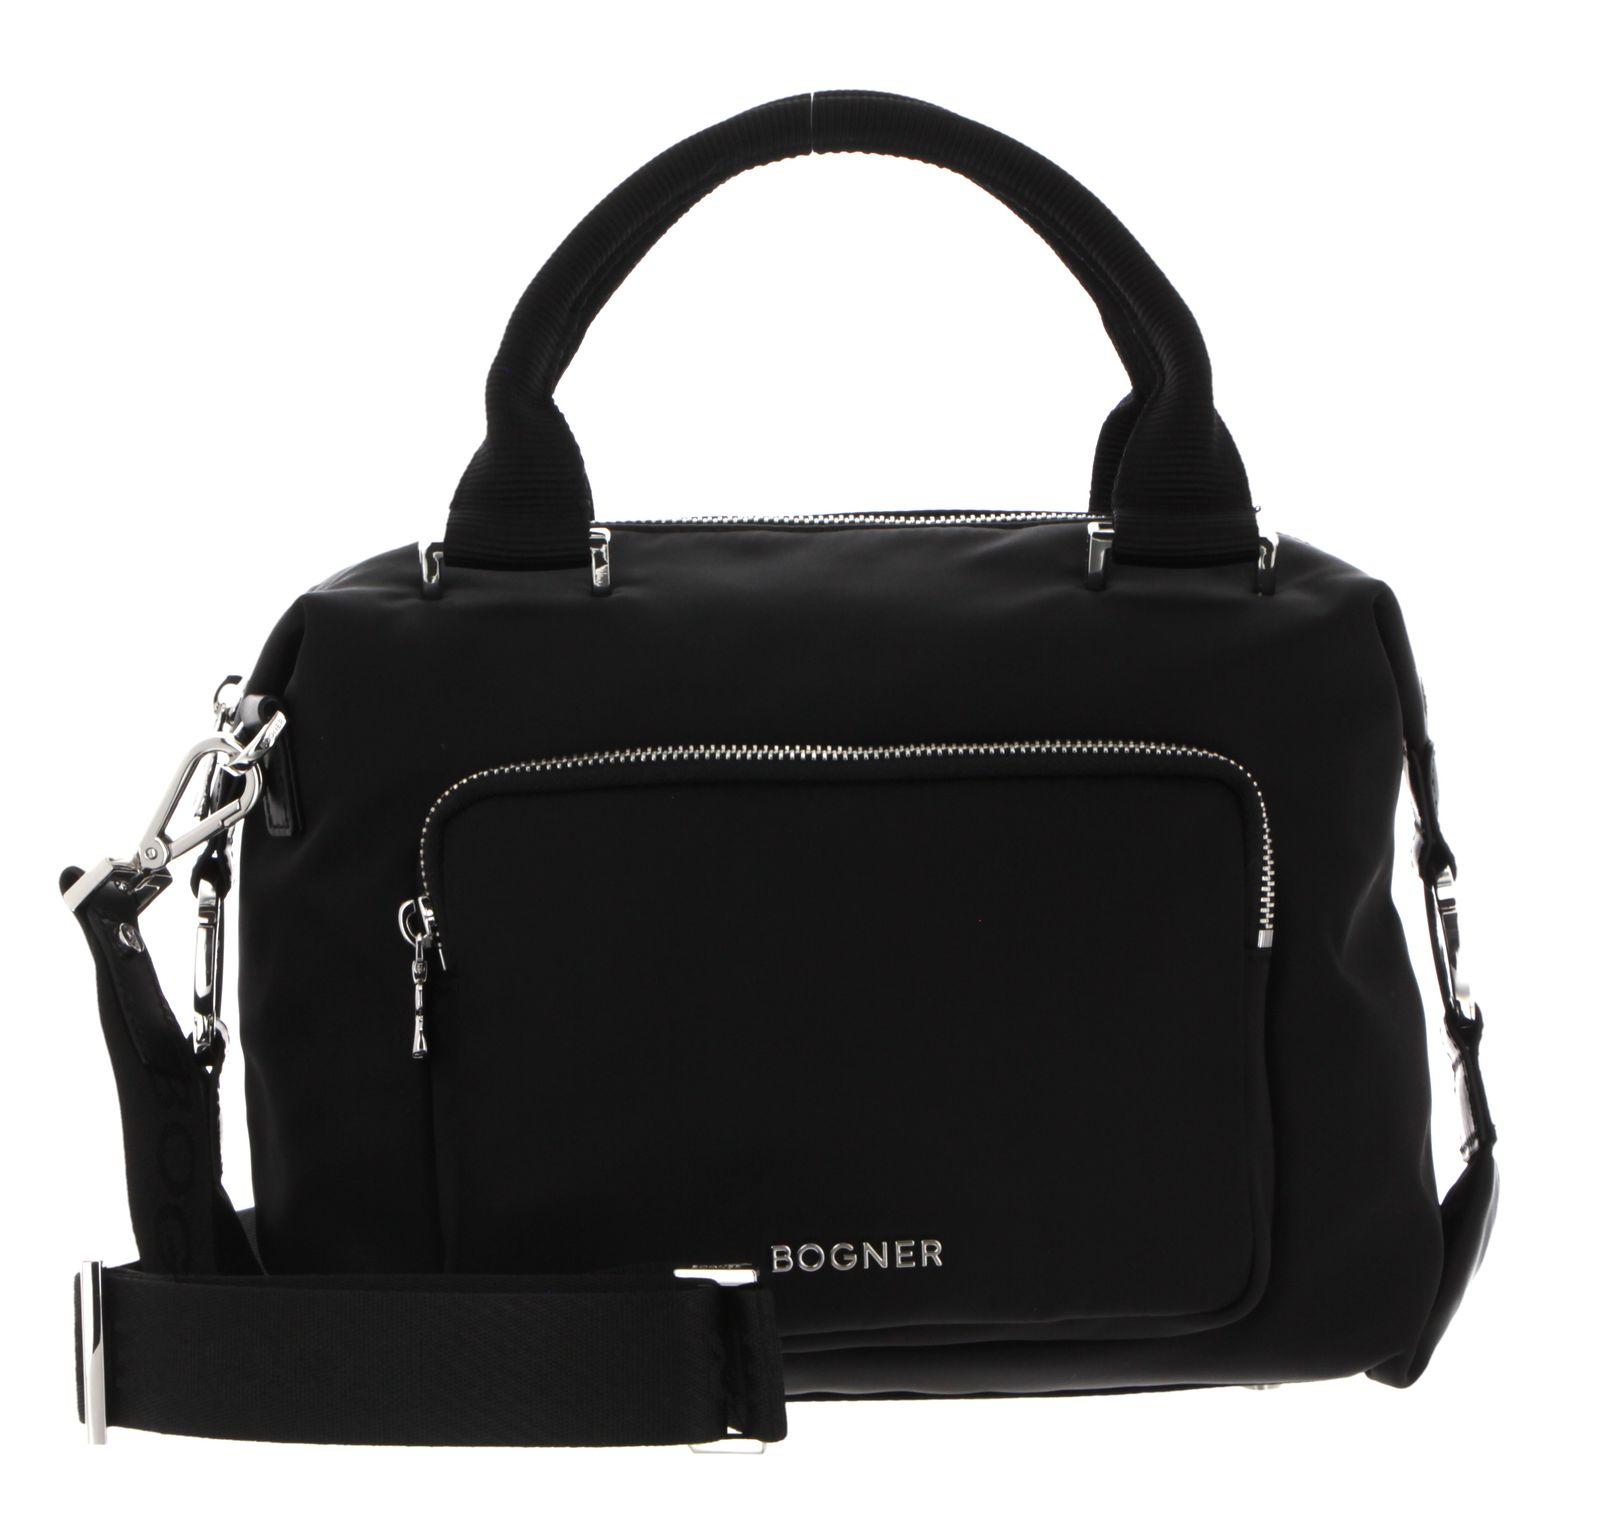 Bogner Klosters Sofie Handbag S Black